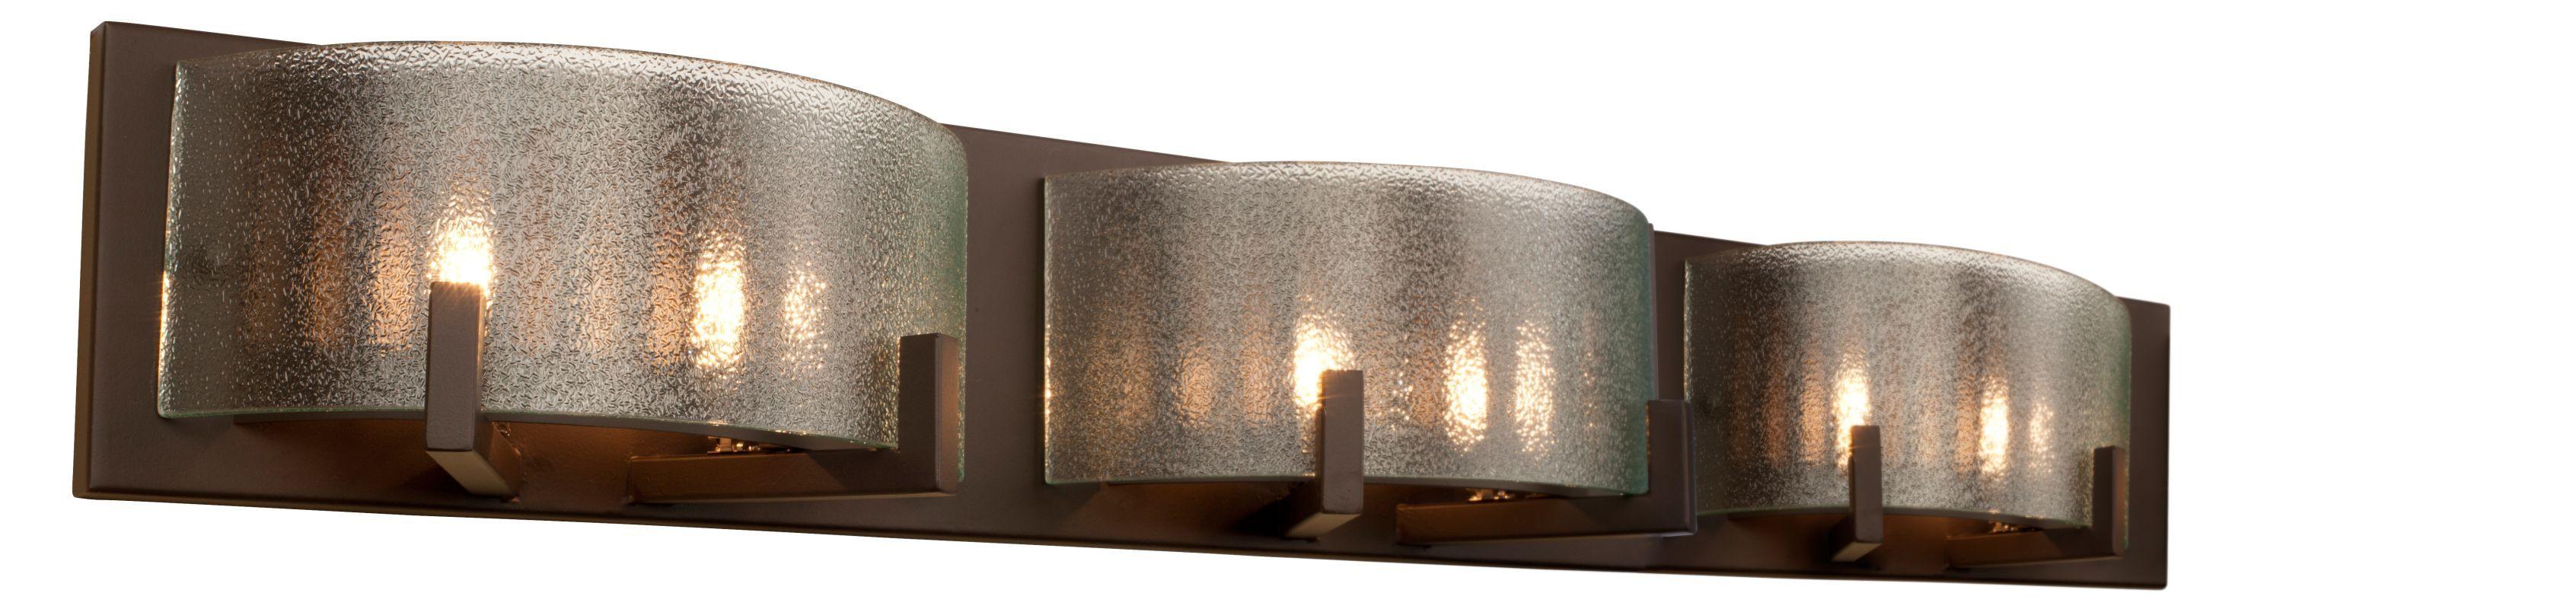 Alternating Current AC Firefly Industrial Bronze Light - Six light bathroom vanity light